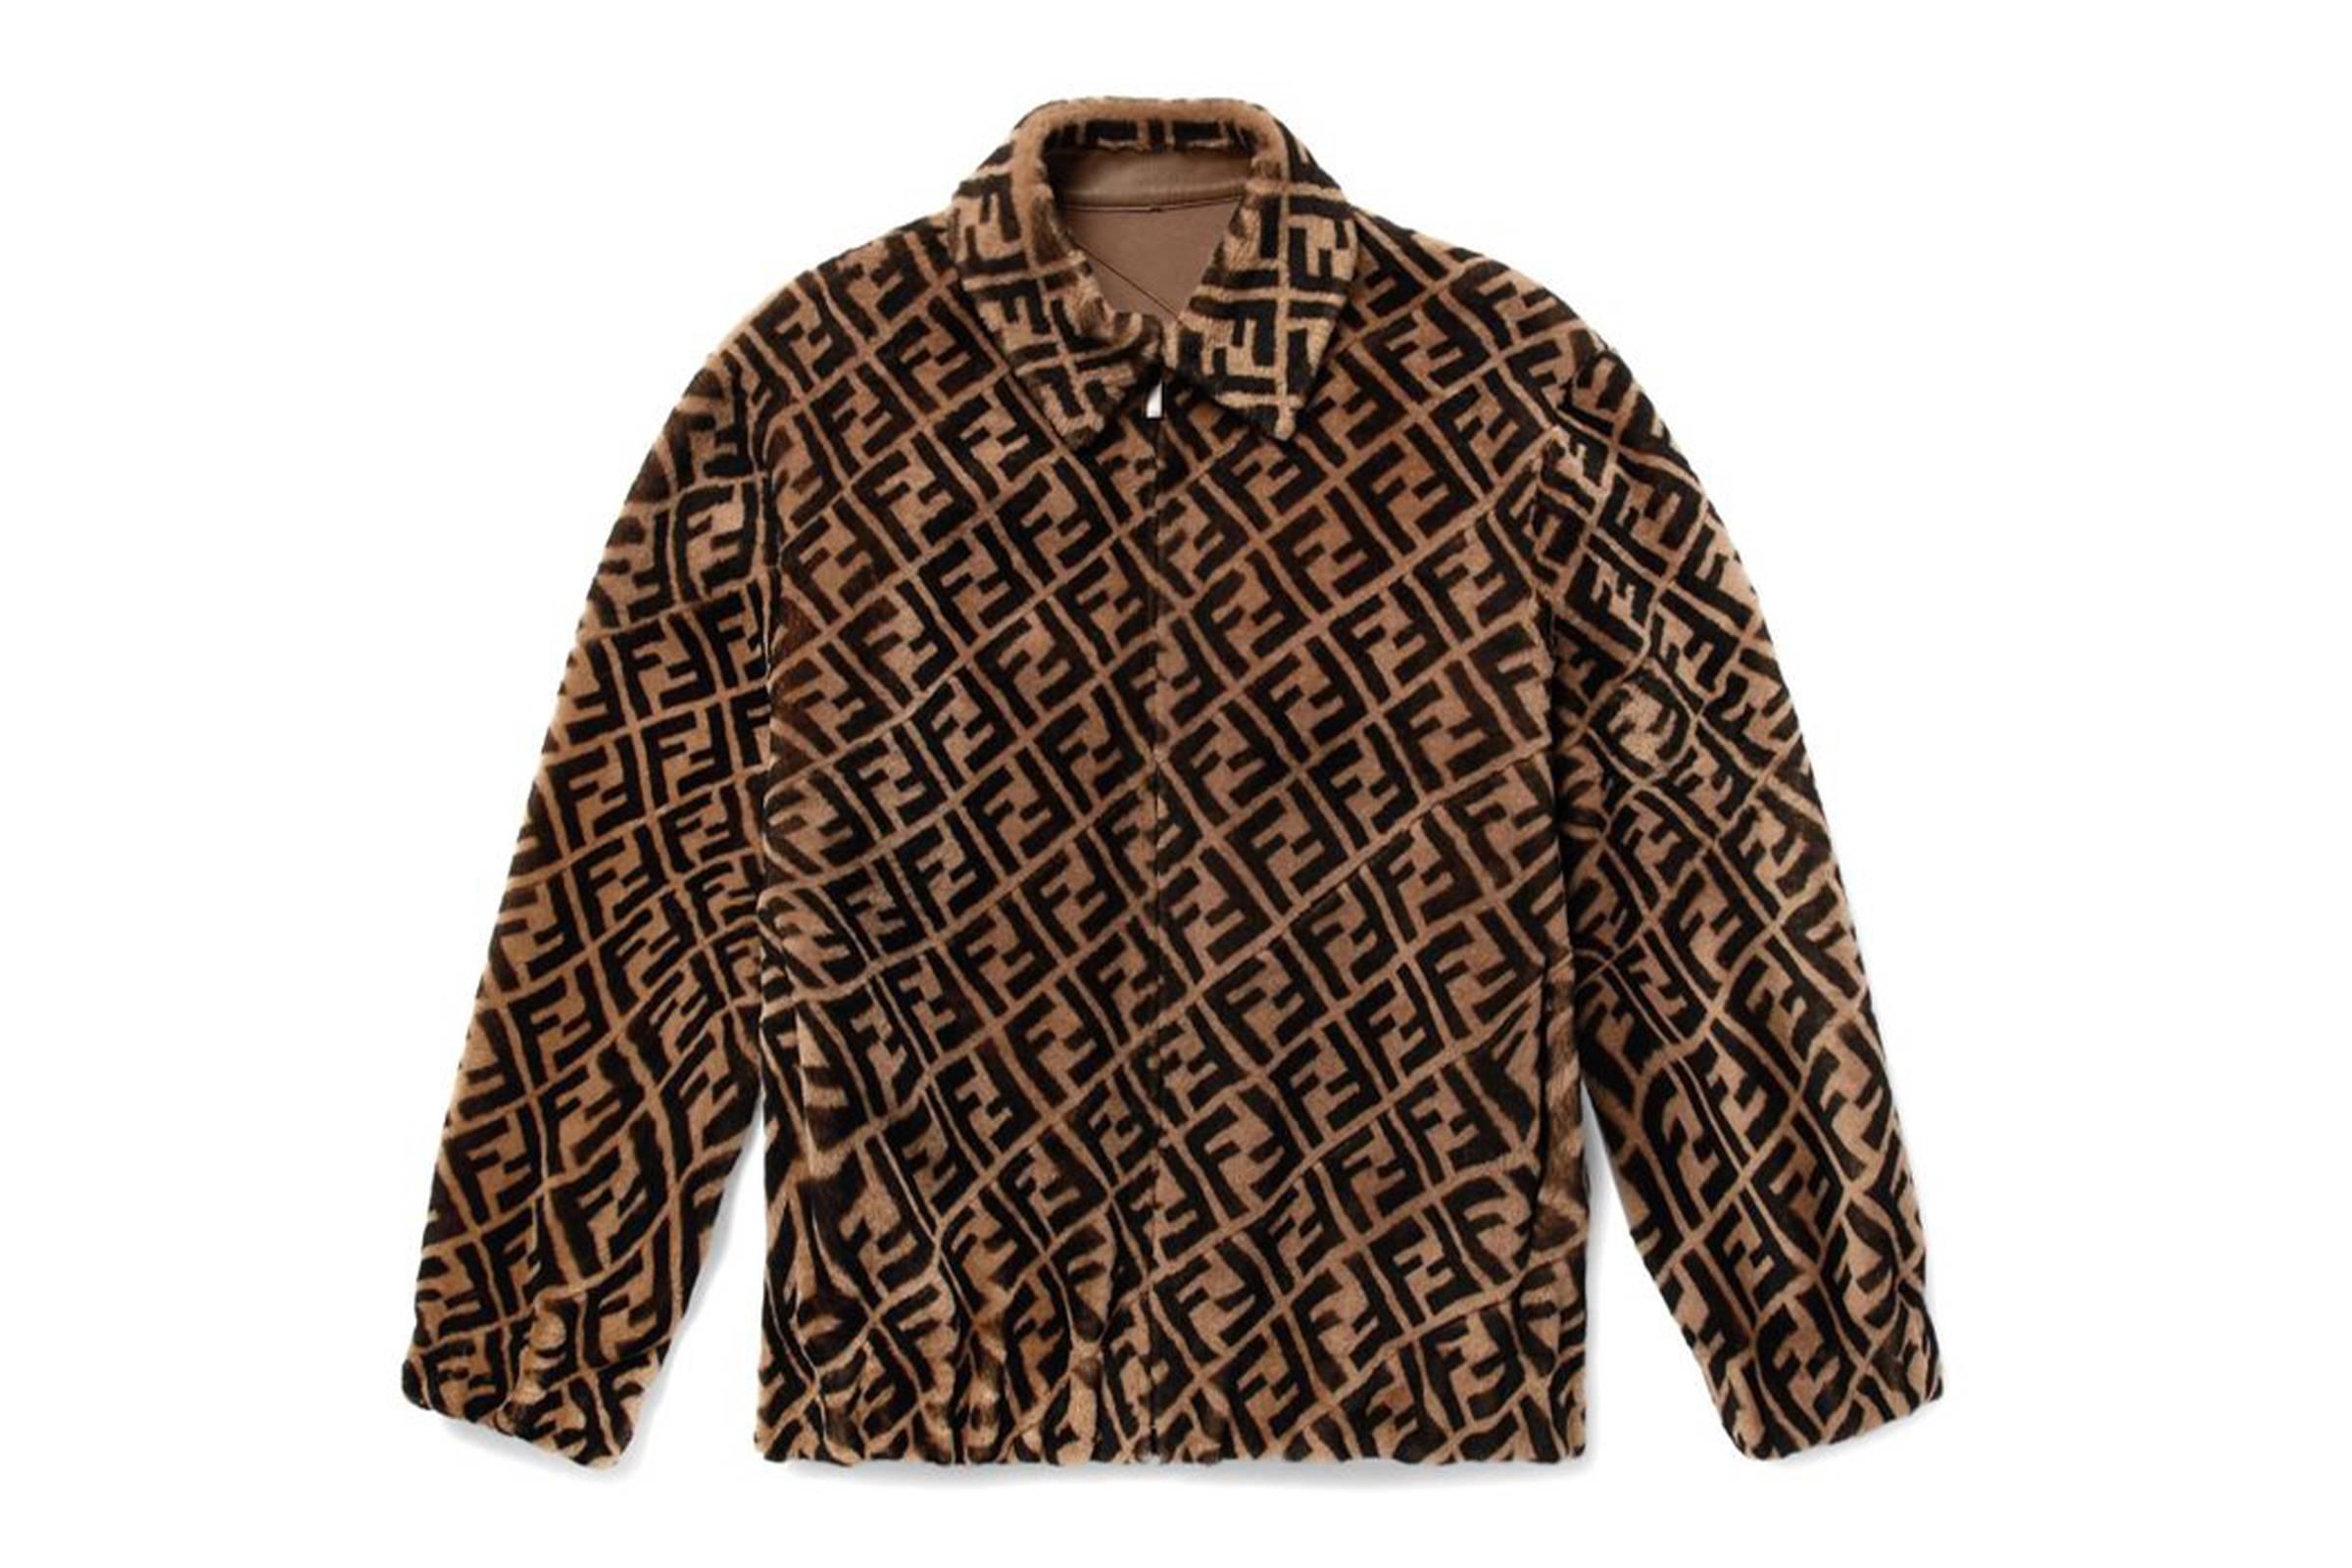 Fendi Reversible Leather and Shearling Jacket